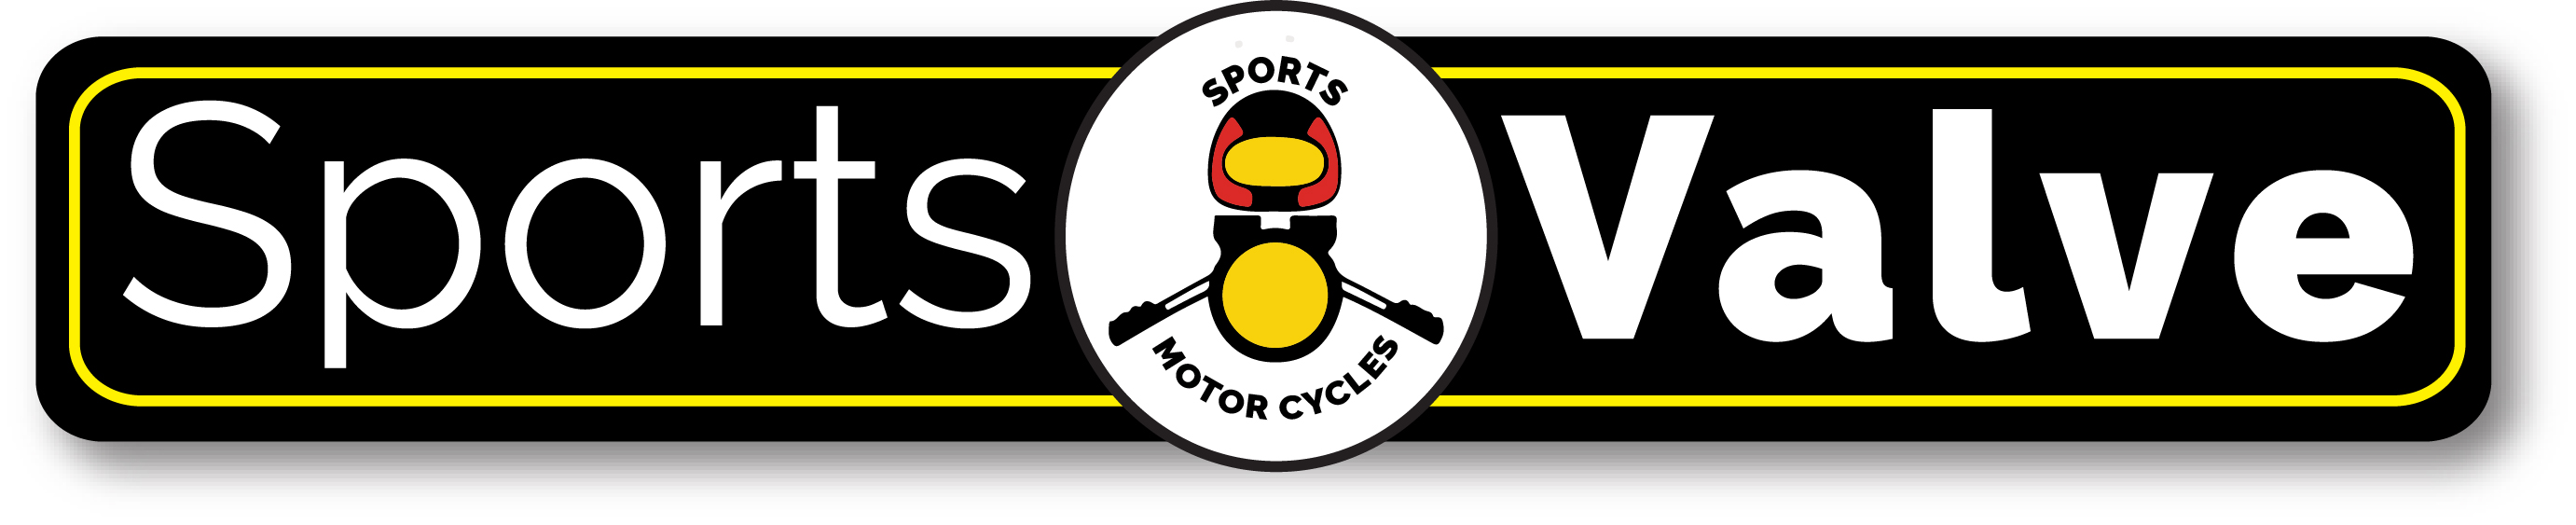 sportsvalve-logo-no-emulator.jpg